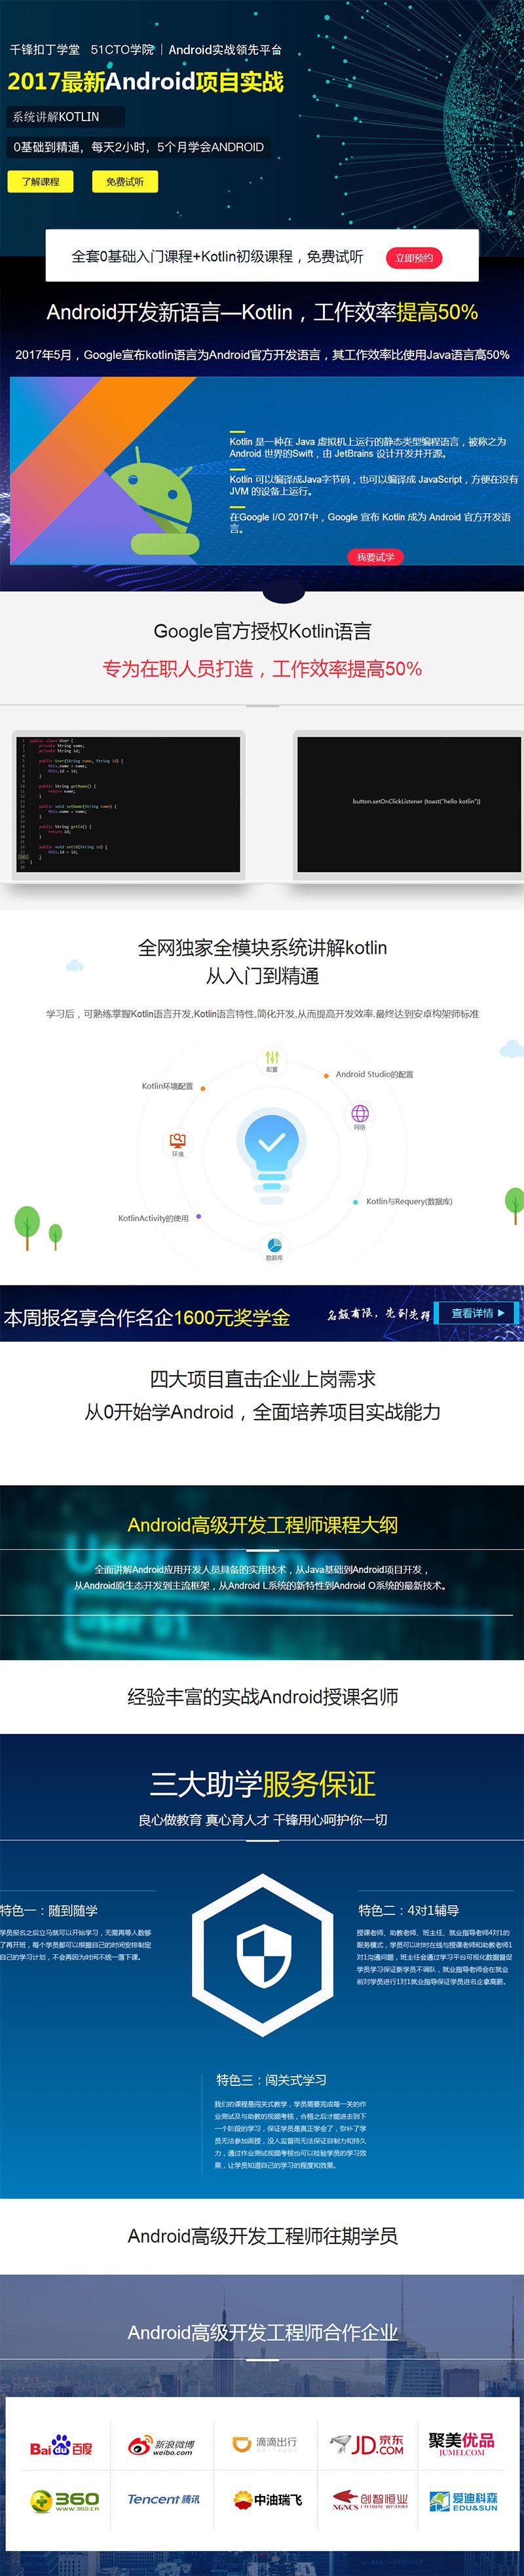 51CTO学院--android微职位高端培训--android高级开发工程师-51CTO学院-专业.jpg